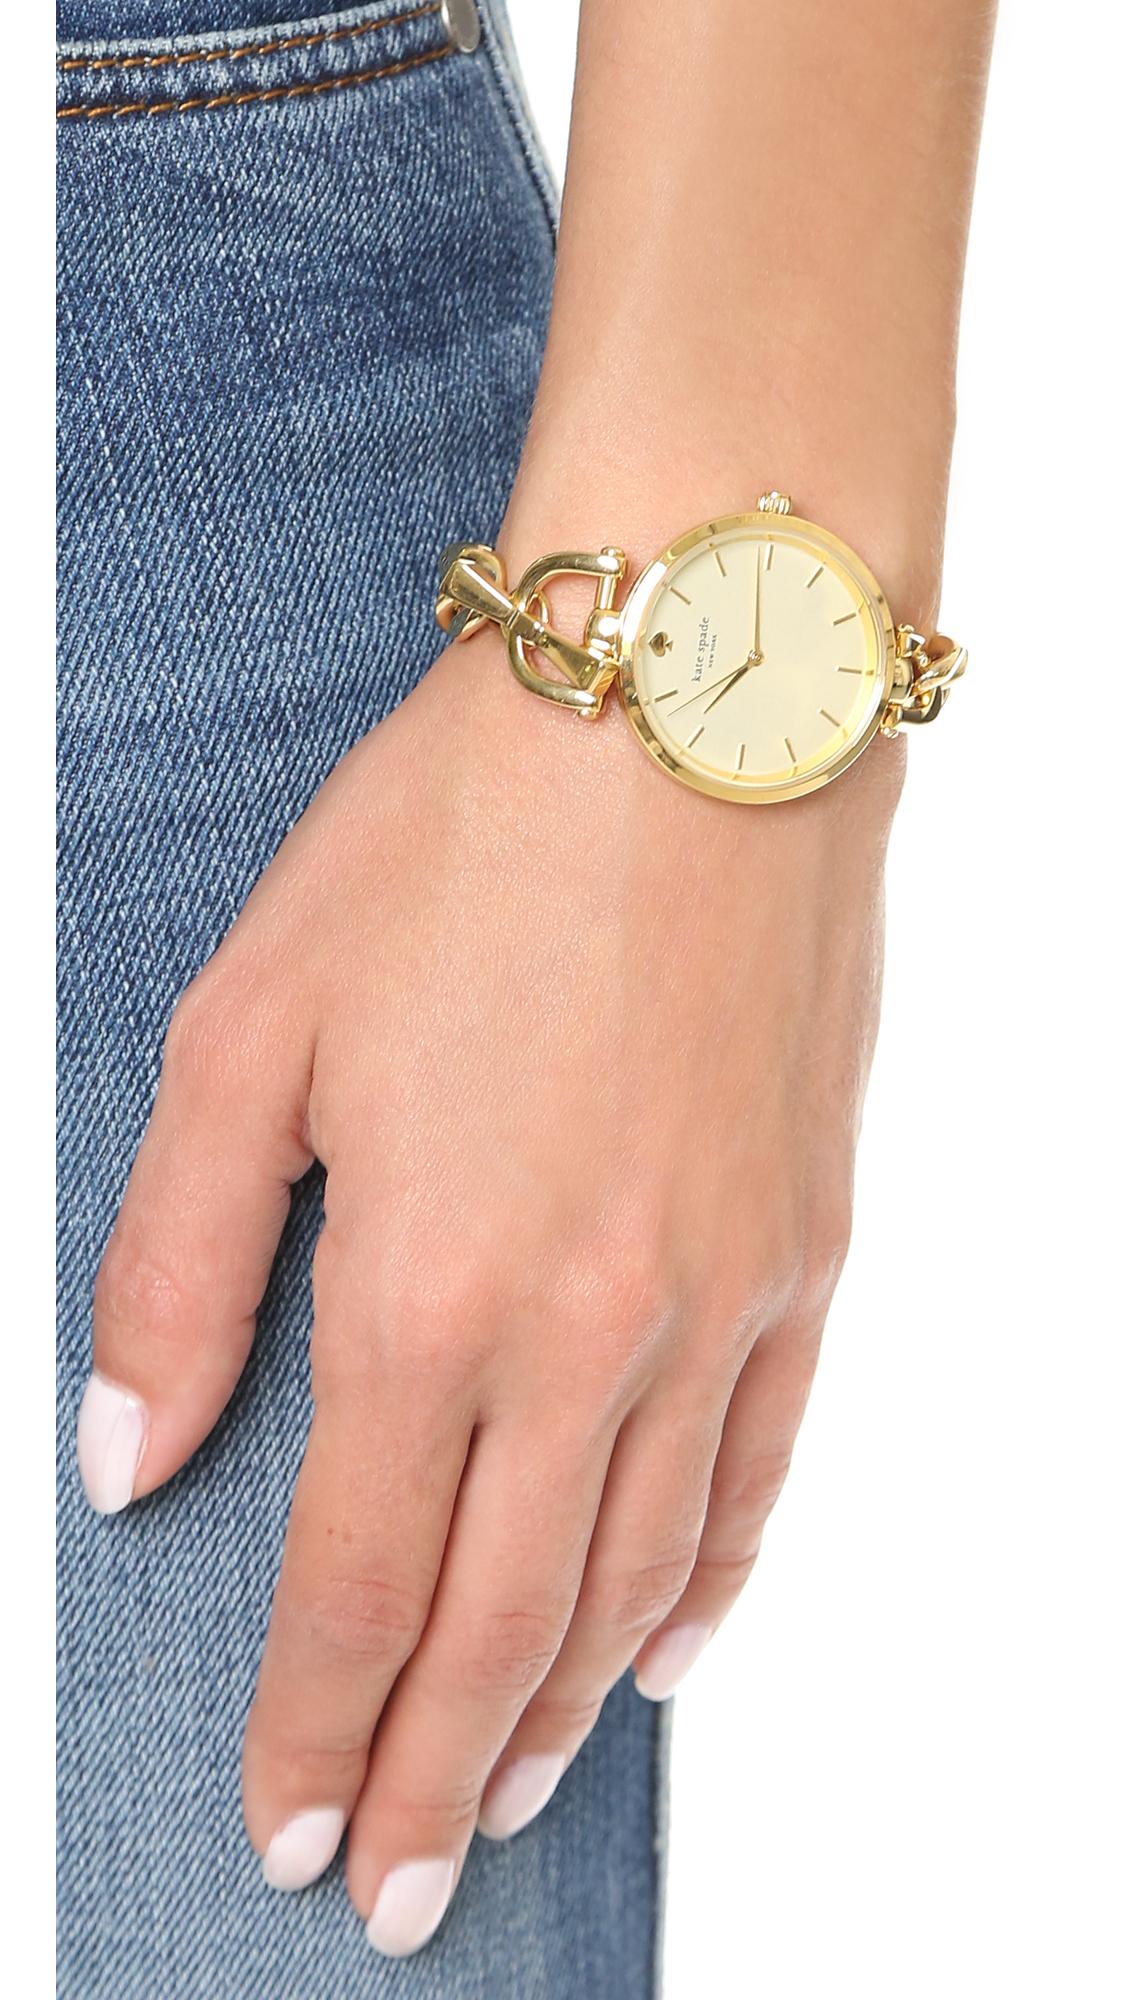 Holland Watch Gold